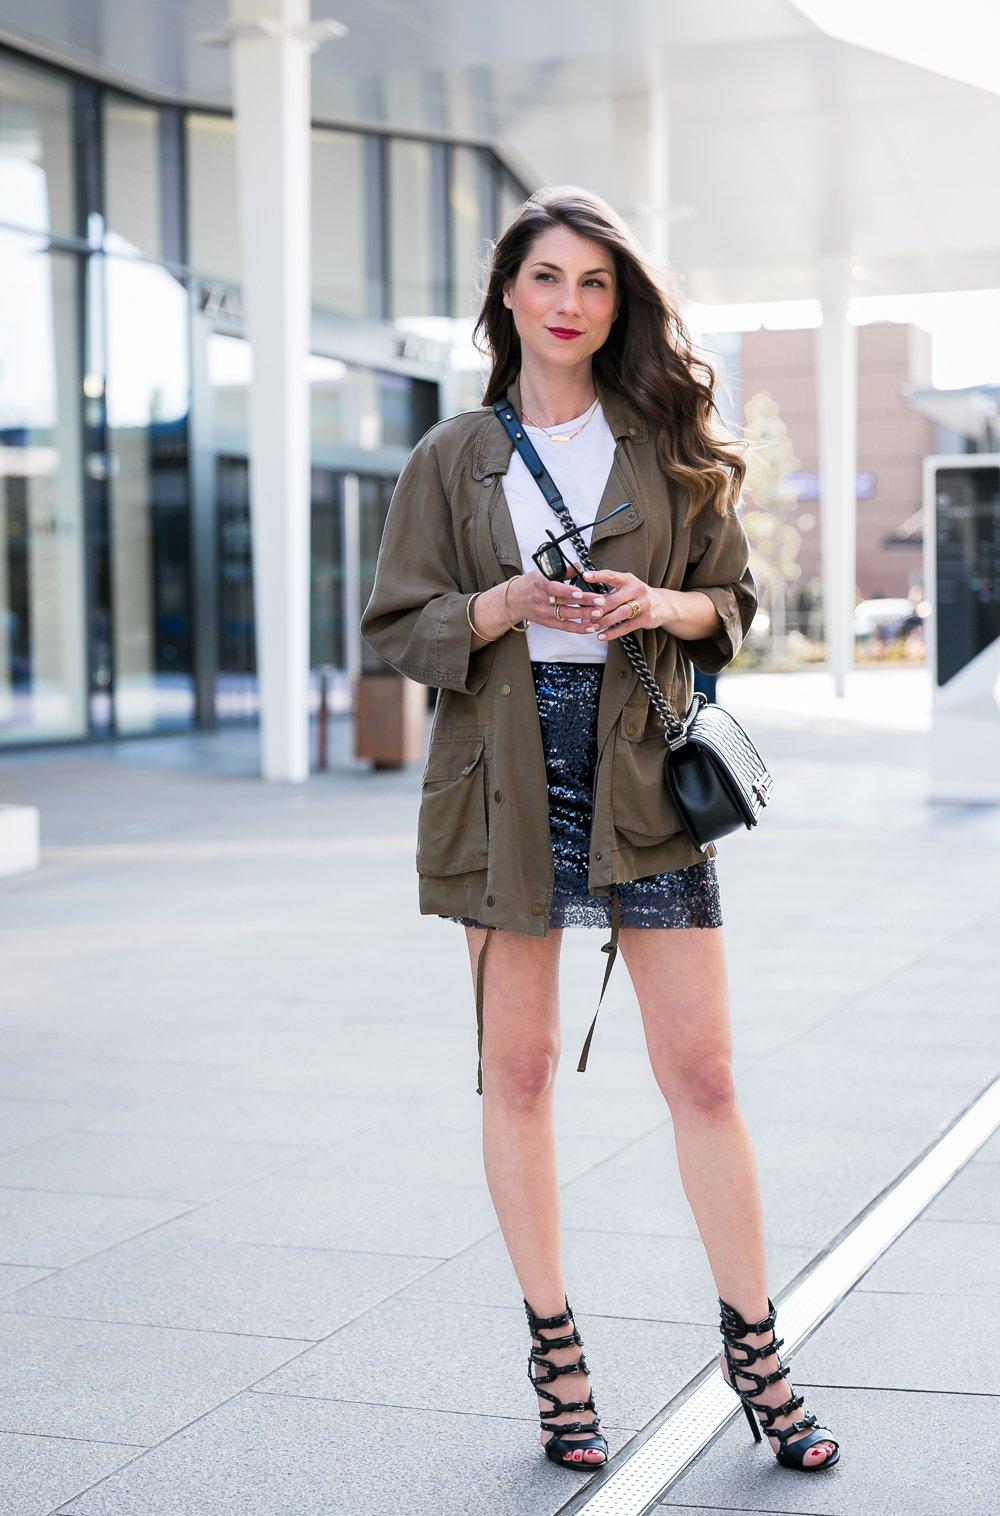 sequin skirt outfit pailletten rock casual chic parka heels chanel boy bag